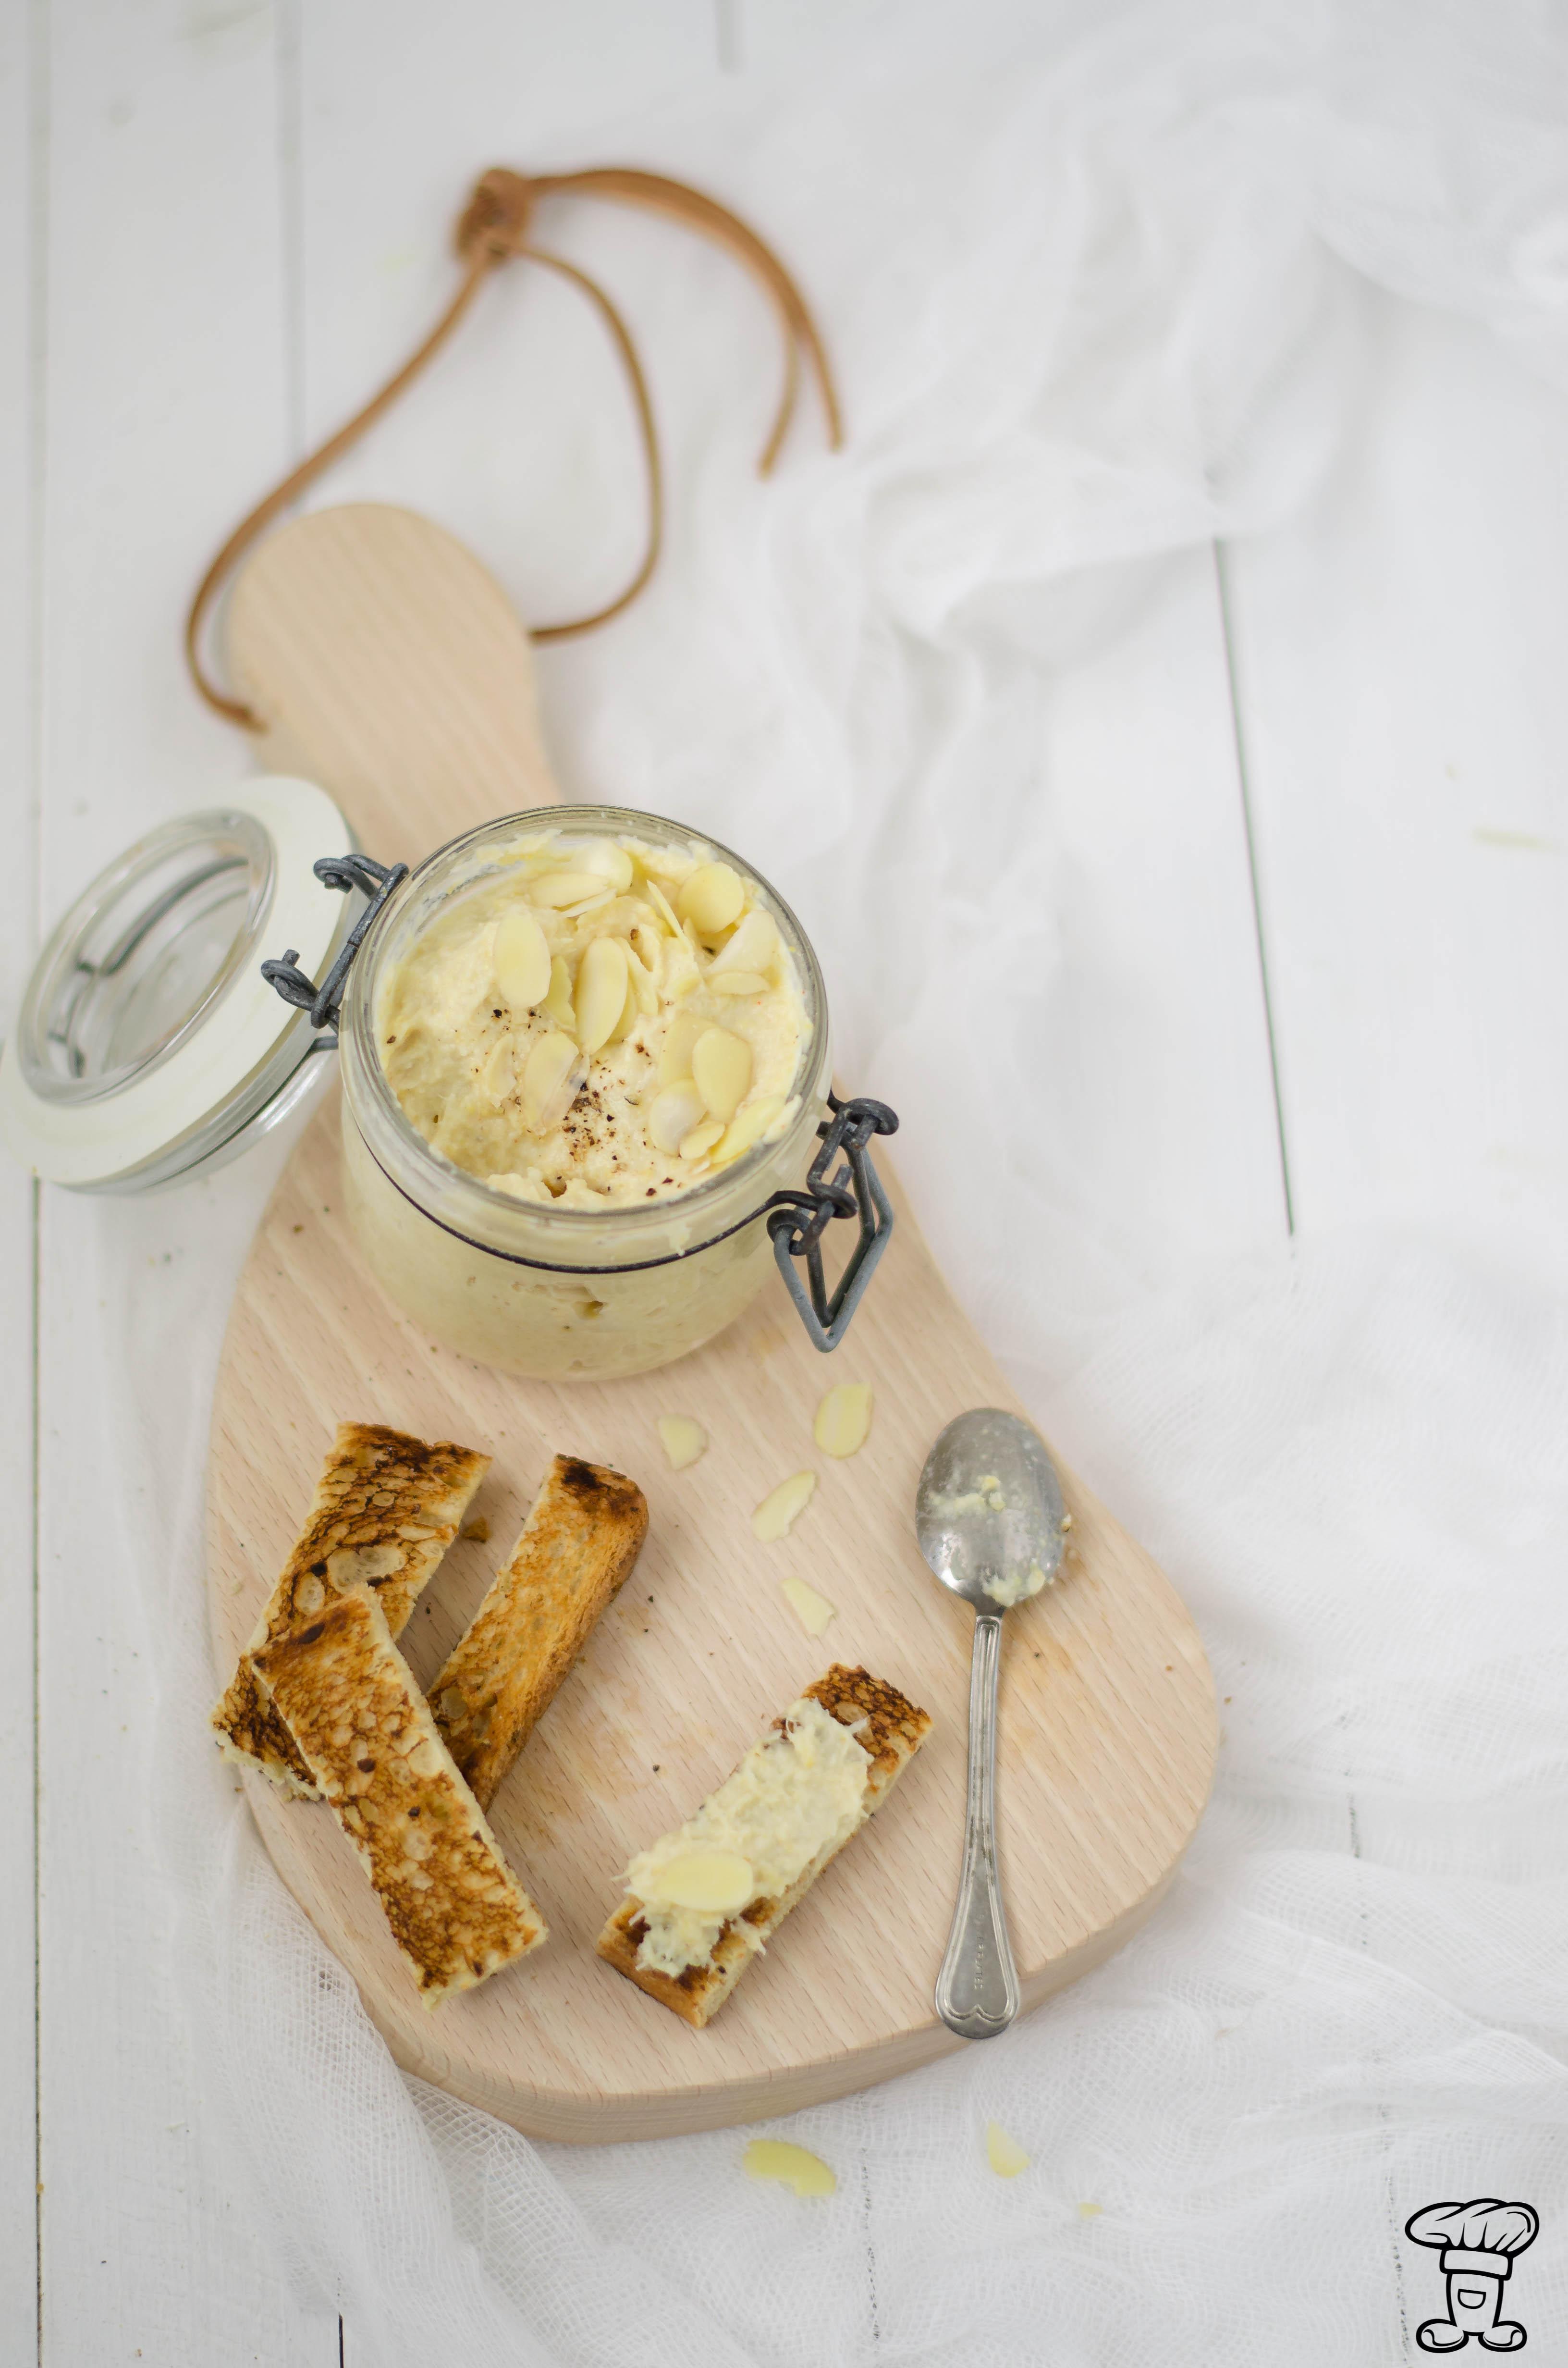 Hummus_asparagi_mandorle3 Hummus di asparagi bianchi e mandorle